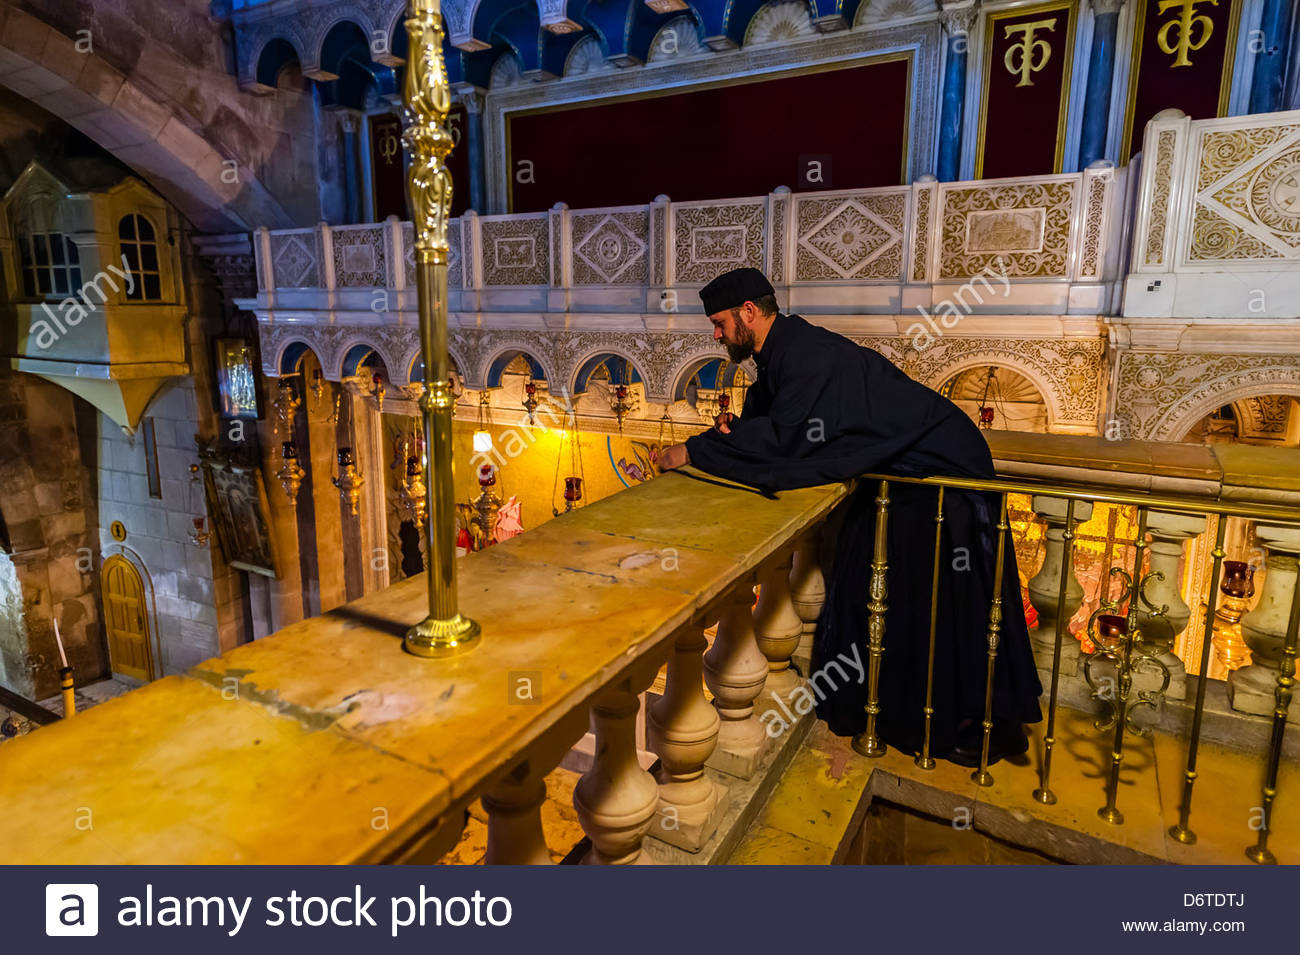 Eine armenische orthodoxe Messe, Kirche des Heiligen Grabes, er Christian Quarter, Altstadt, Jerusalem, Israel. Stockbild